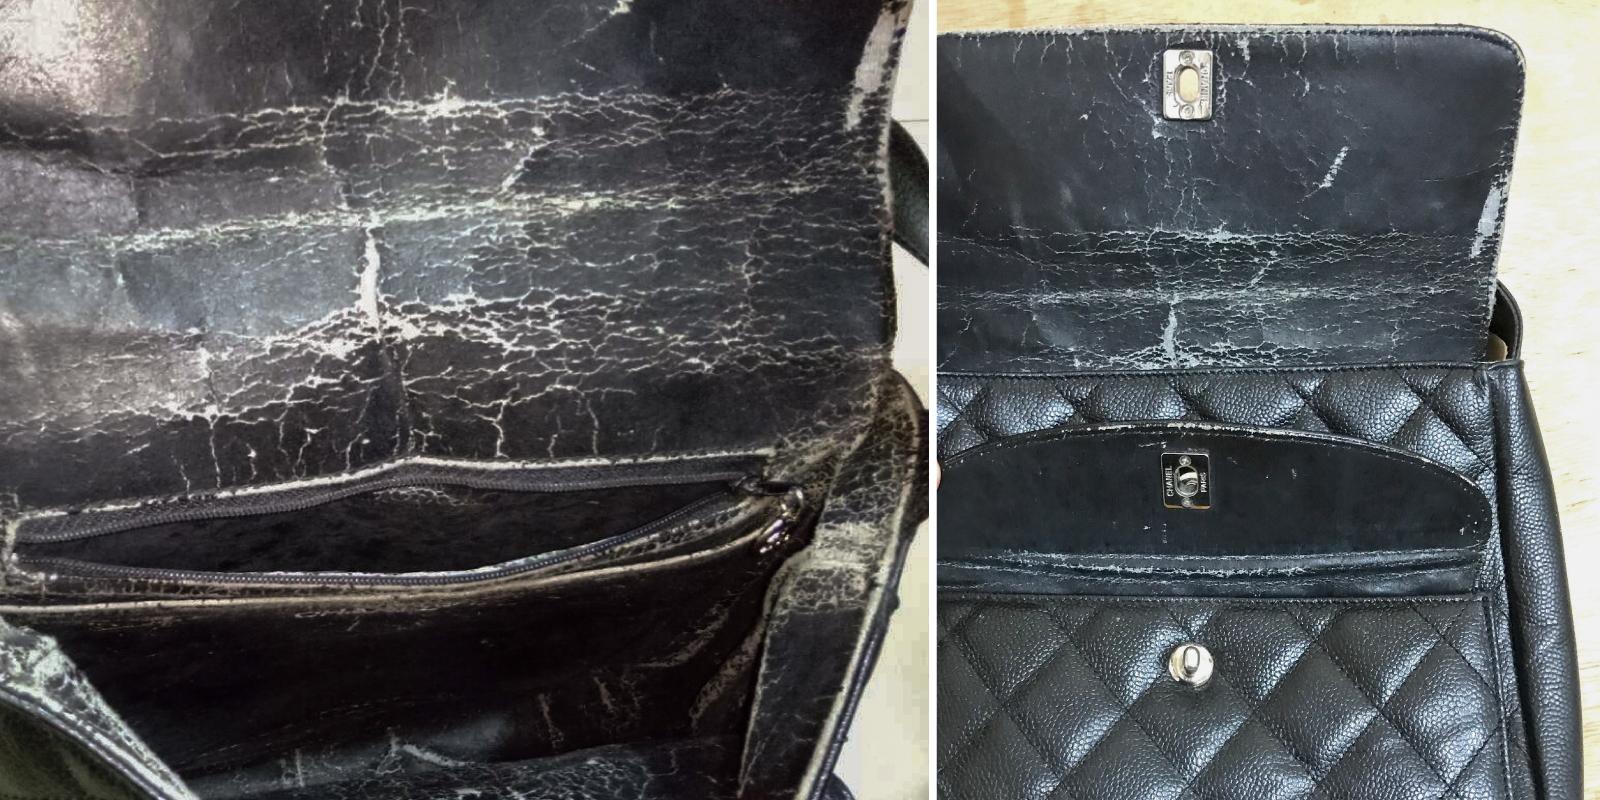 Chanel 菱格纹包内里翻新与背带更换